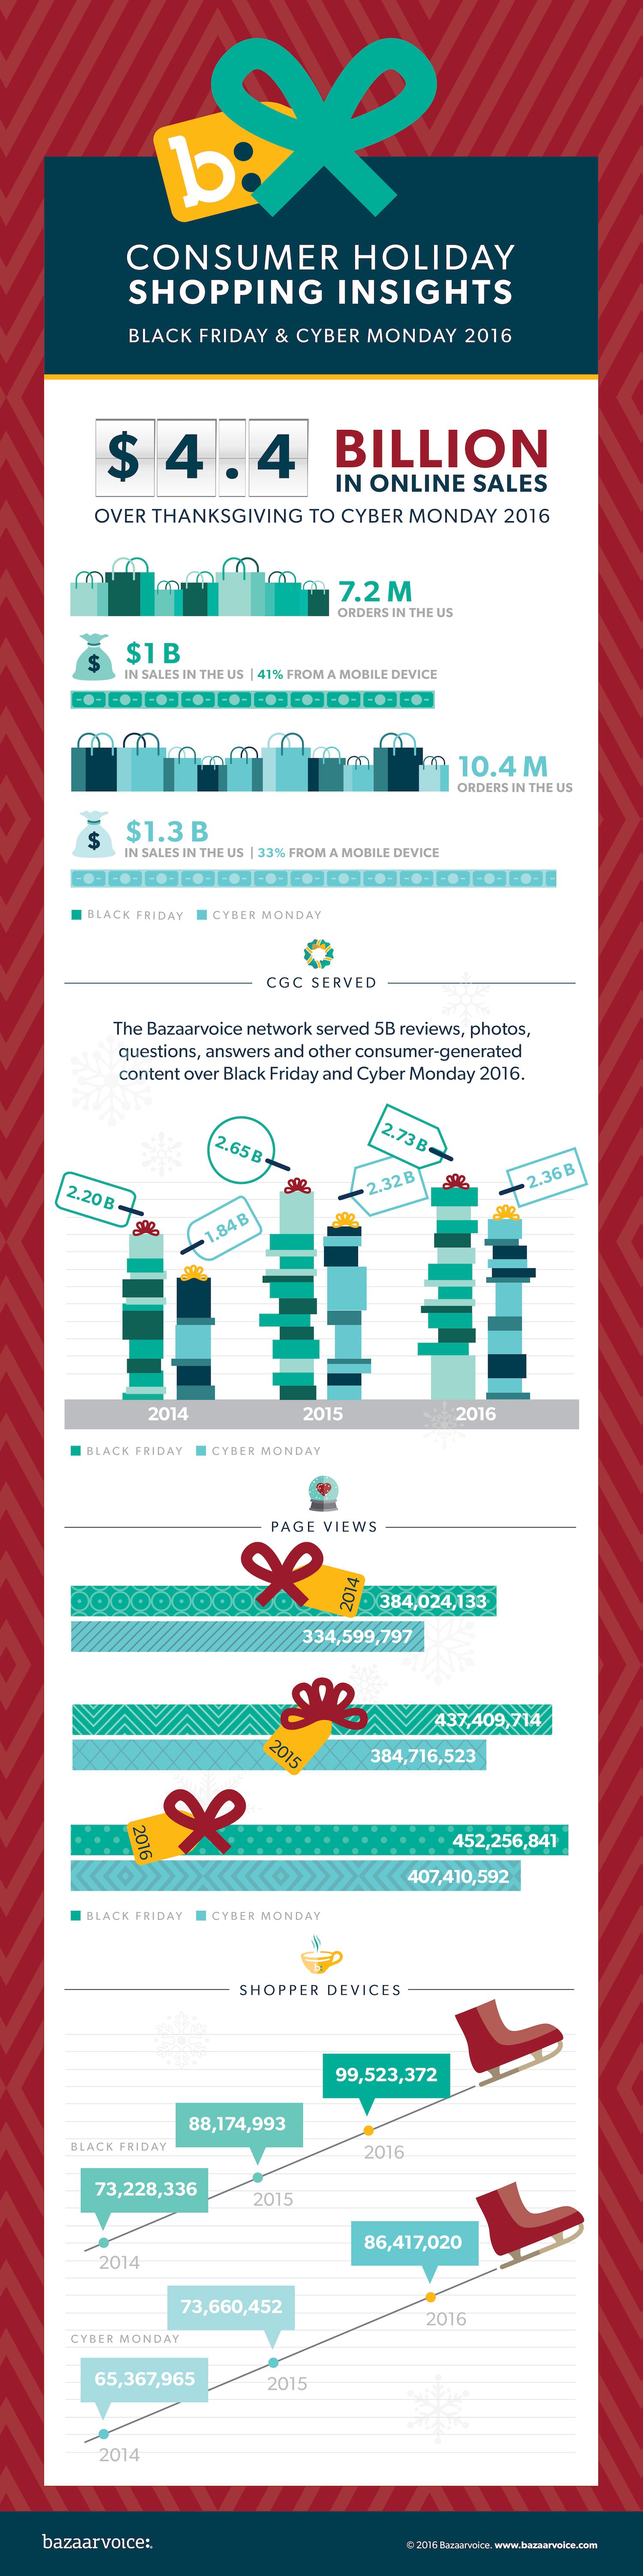 bv-holidayshopping-infographic-2016